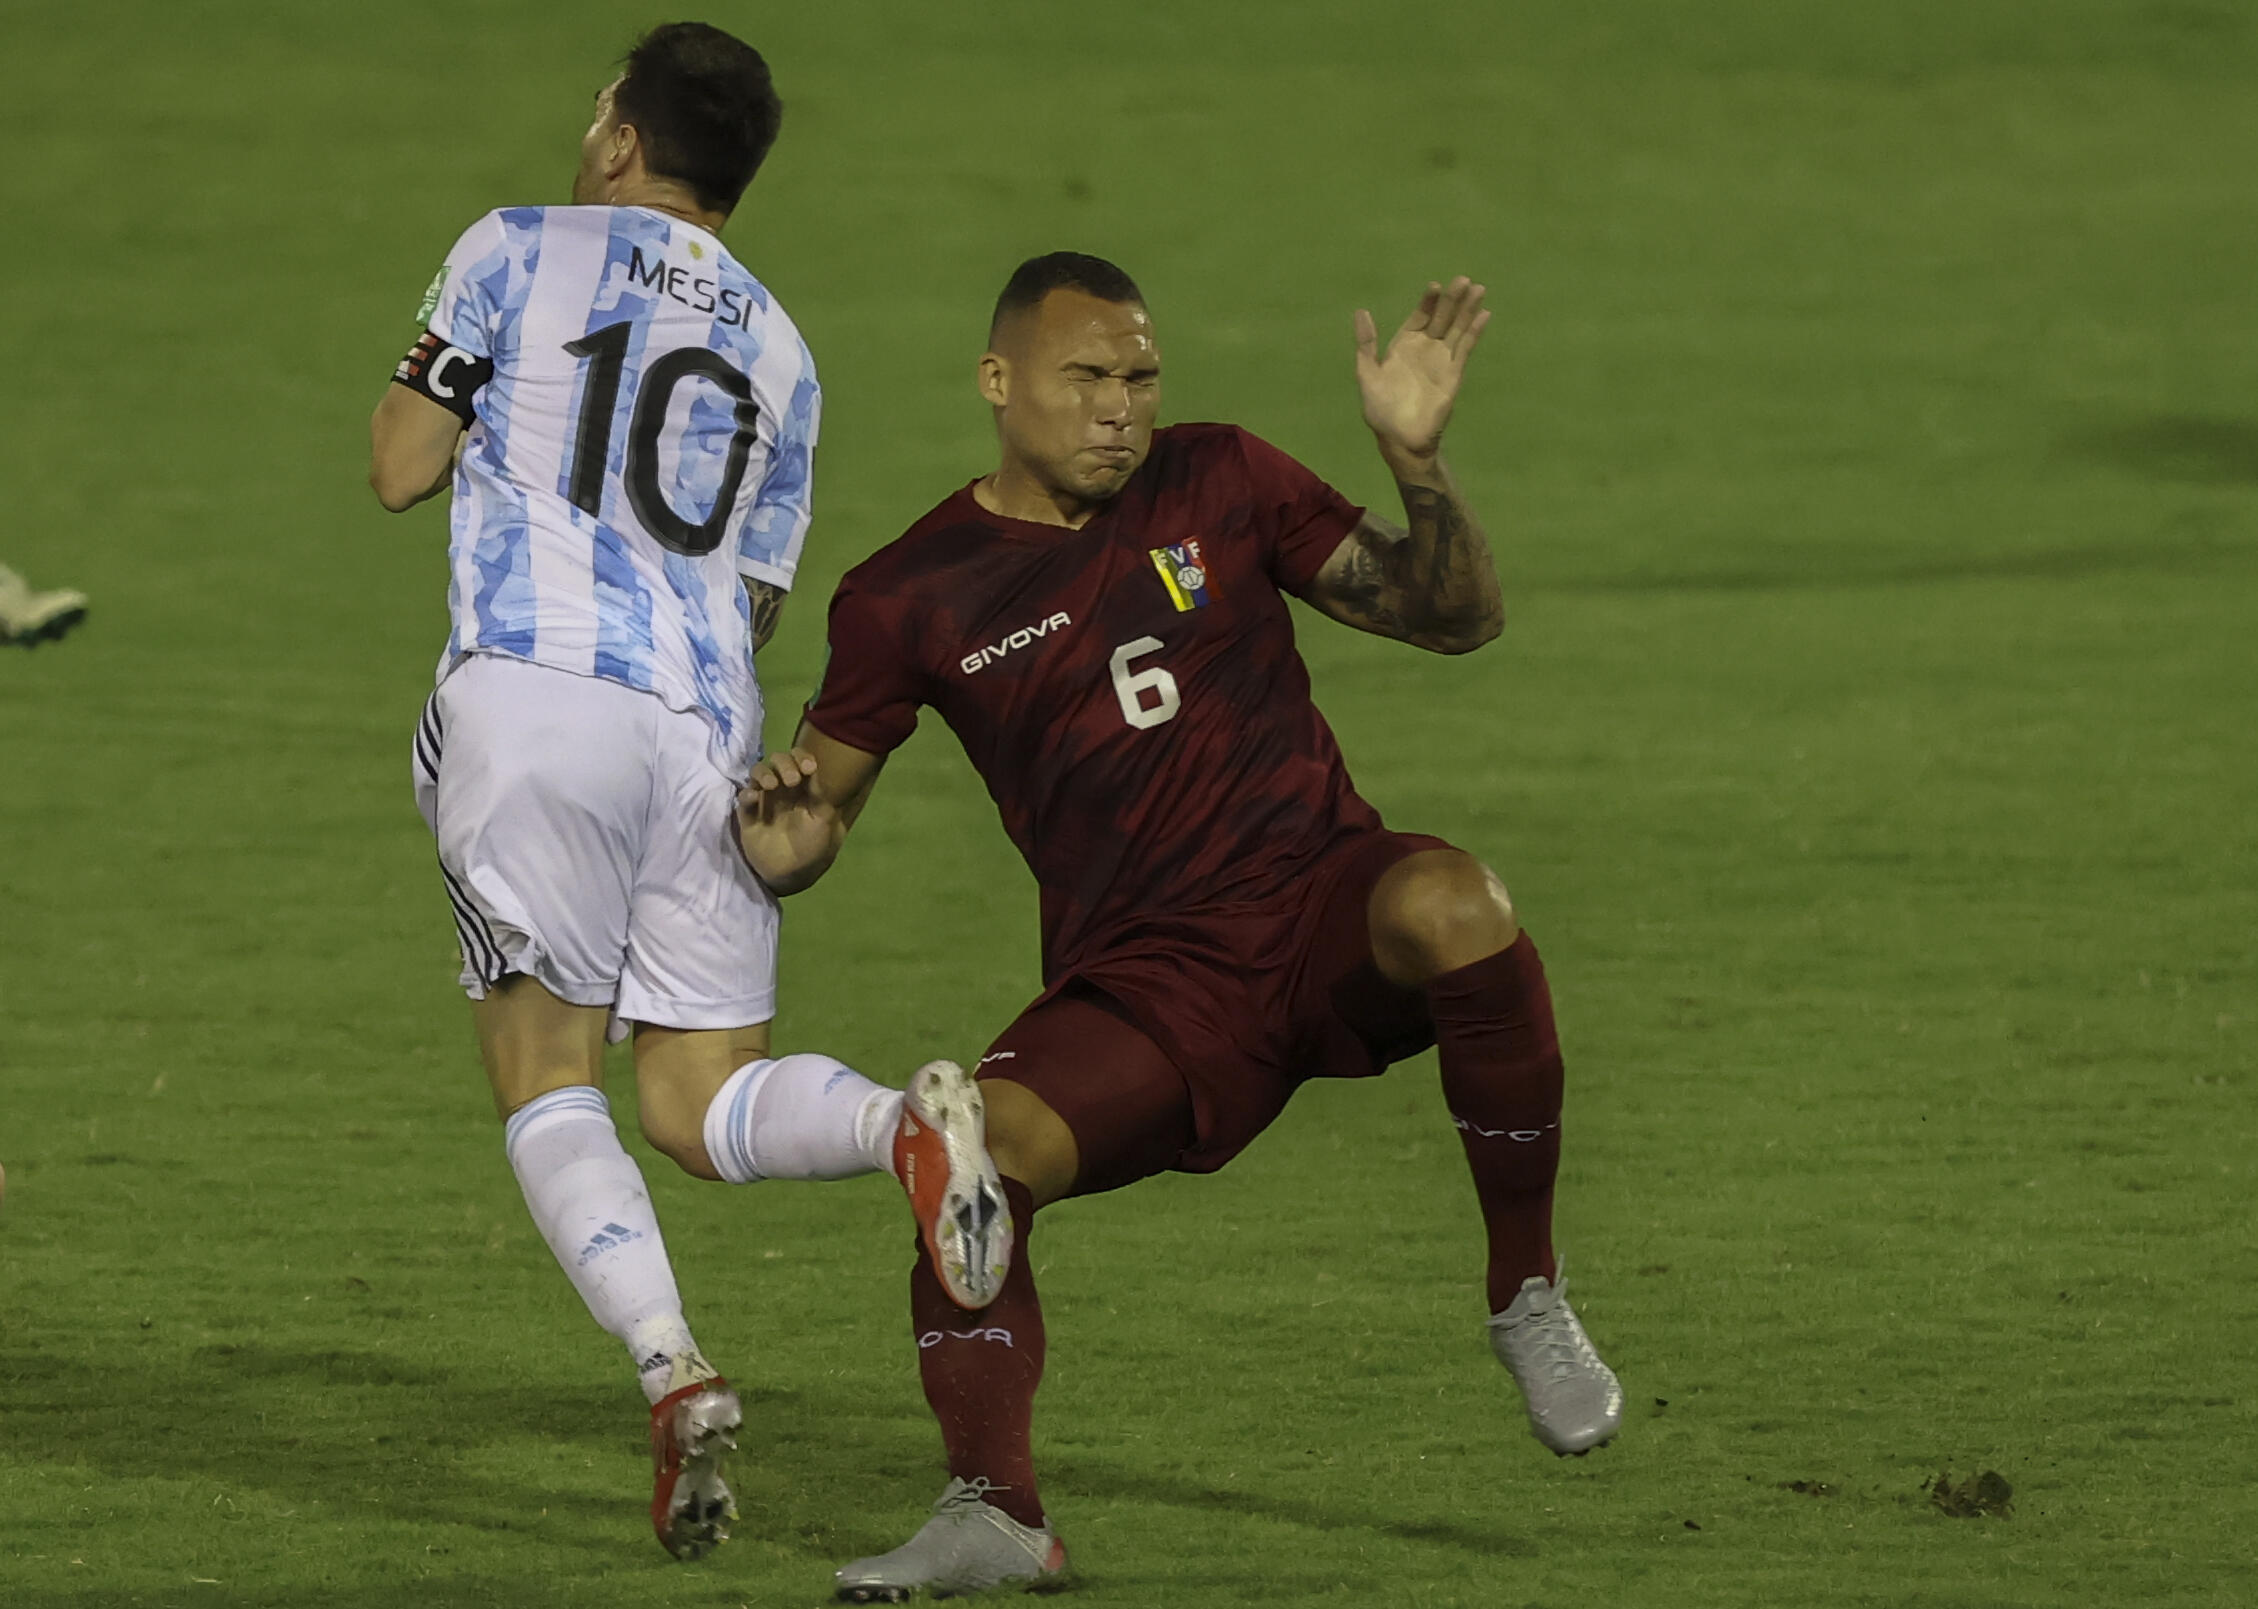 Venezuelan Luis Adrian Martinez's rash challenge on Argentina's Lionel Messi (left) earned him a straight red card